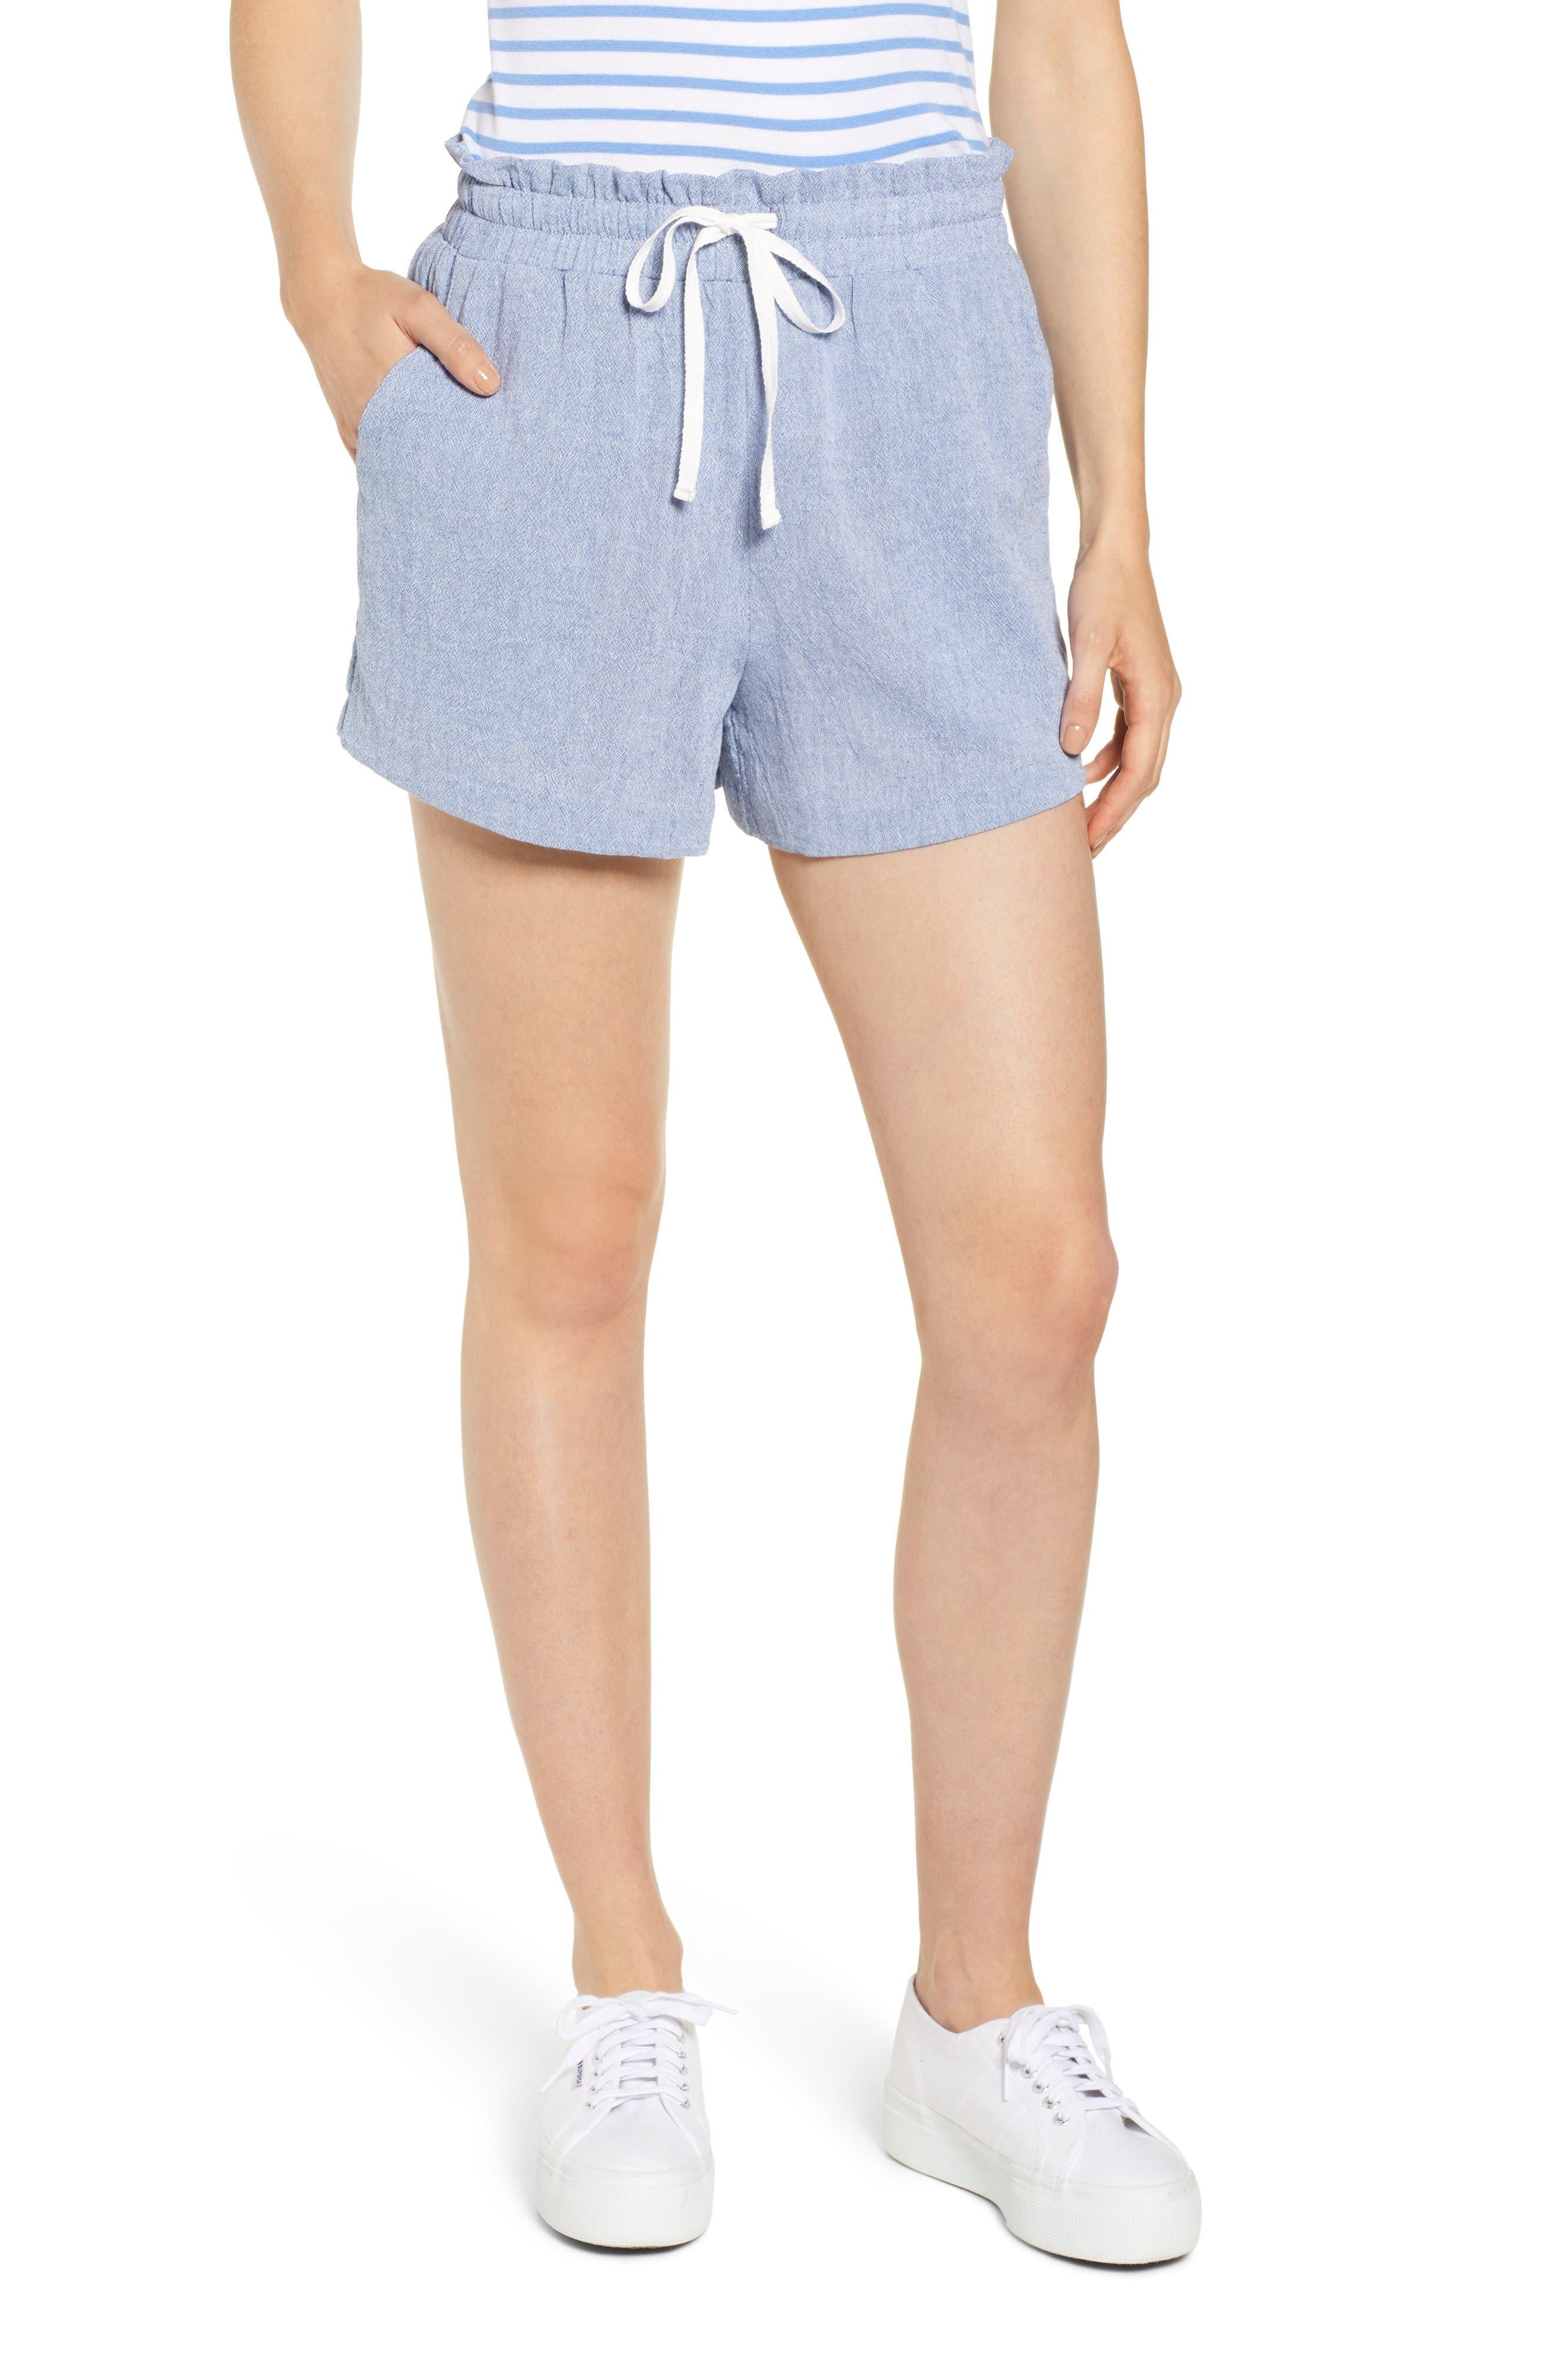 Petite Gibson X Hi Sugarplum! Cabo Drawstring Shorts, Blue